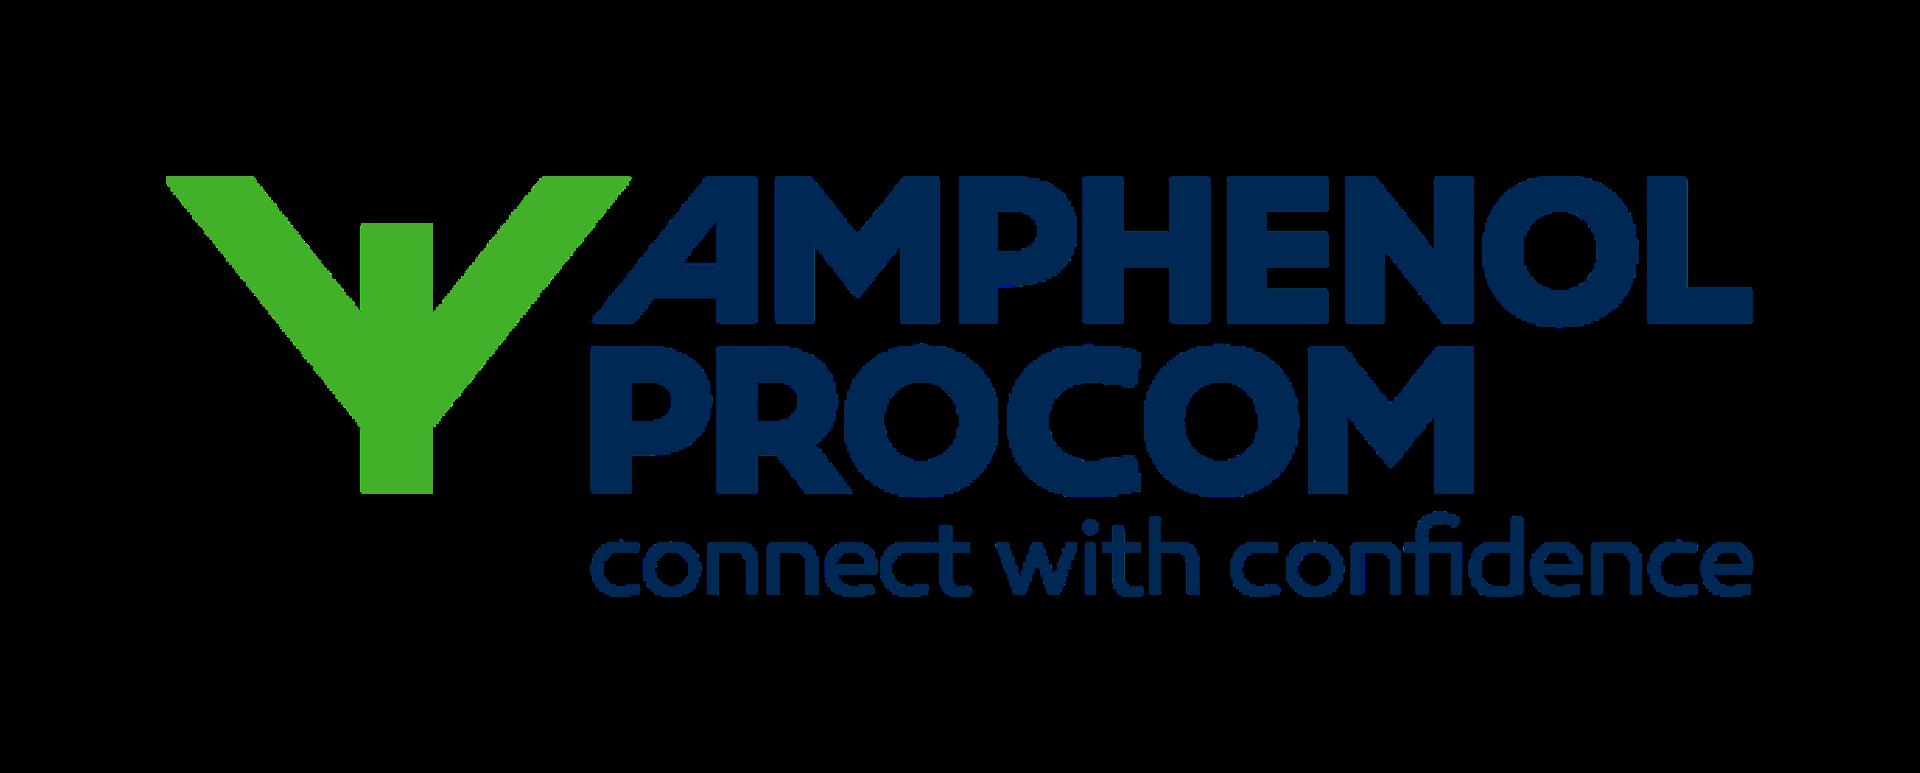 procom-logo-1 copy